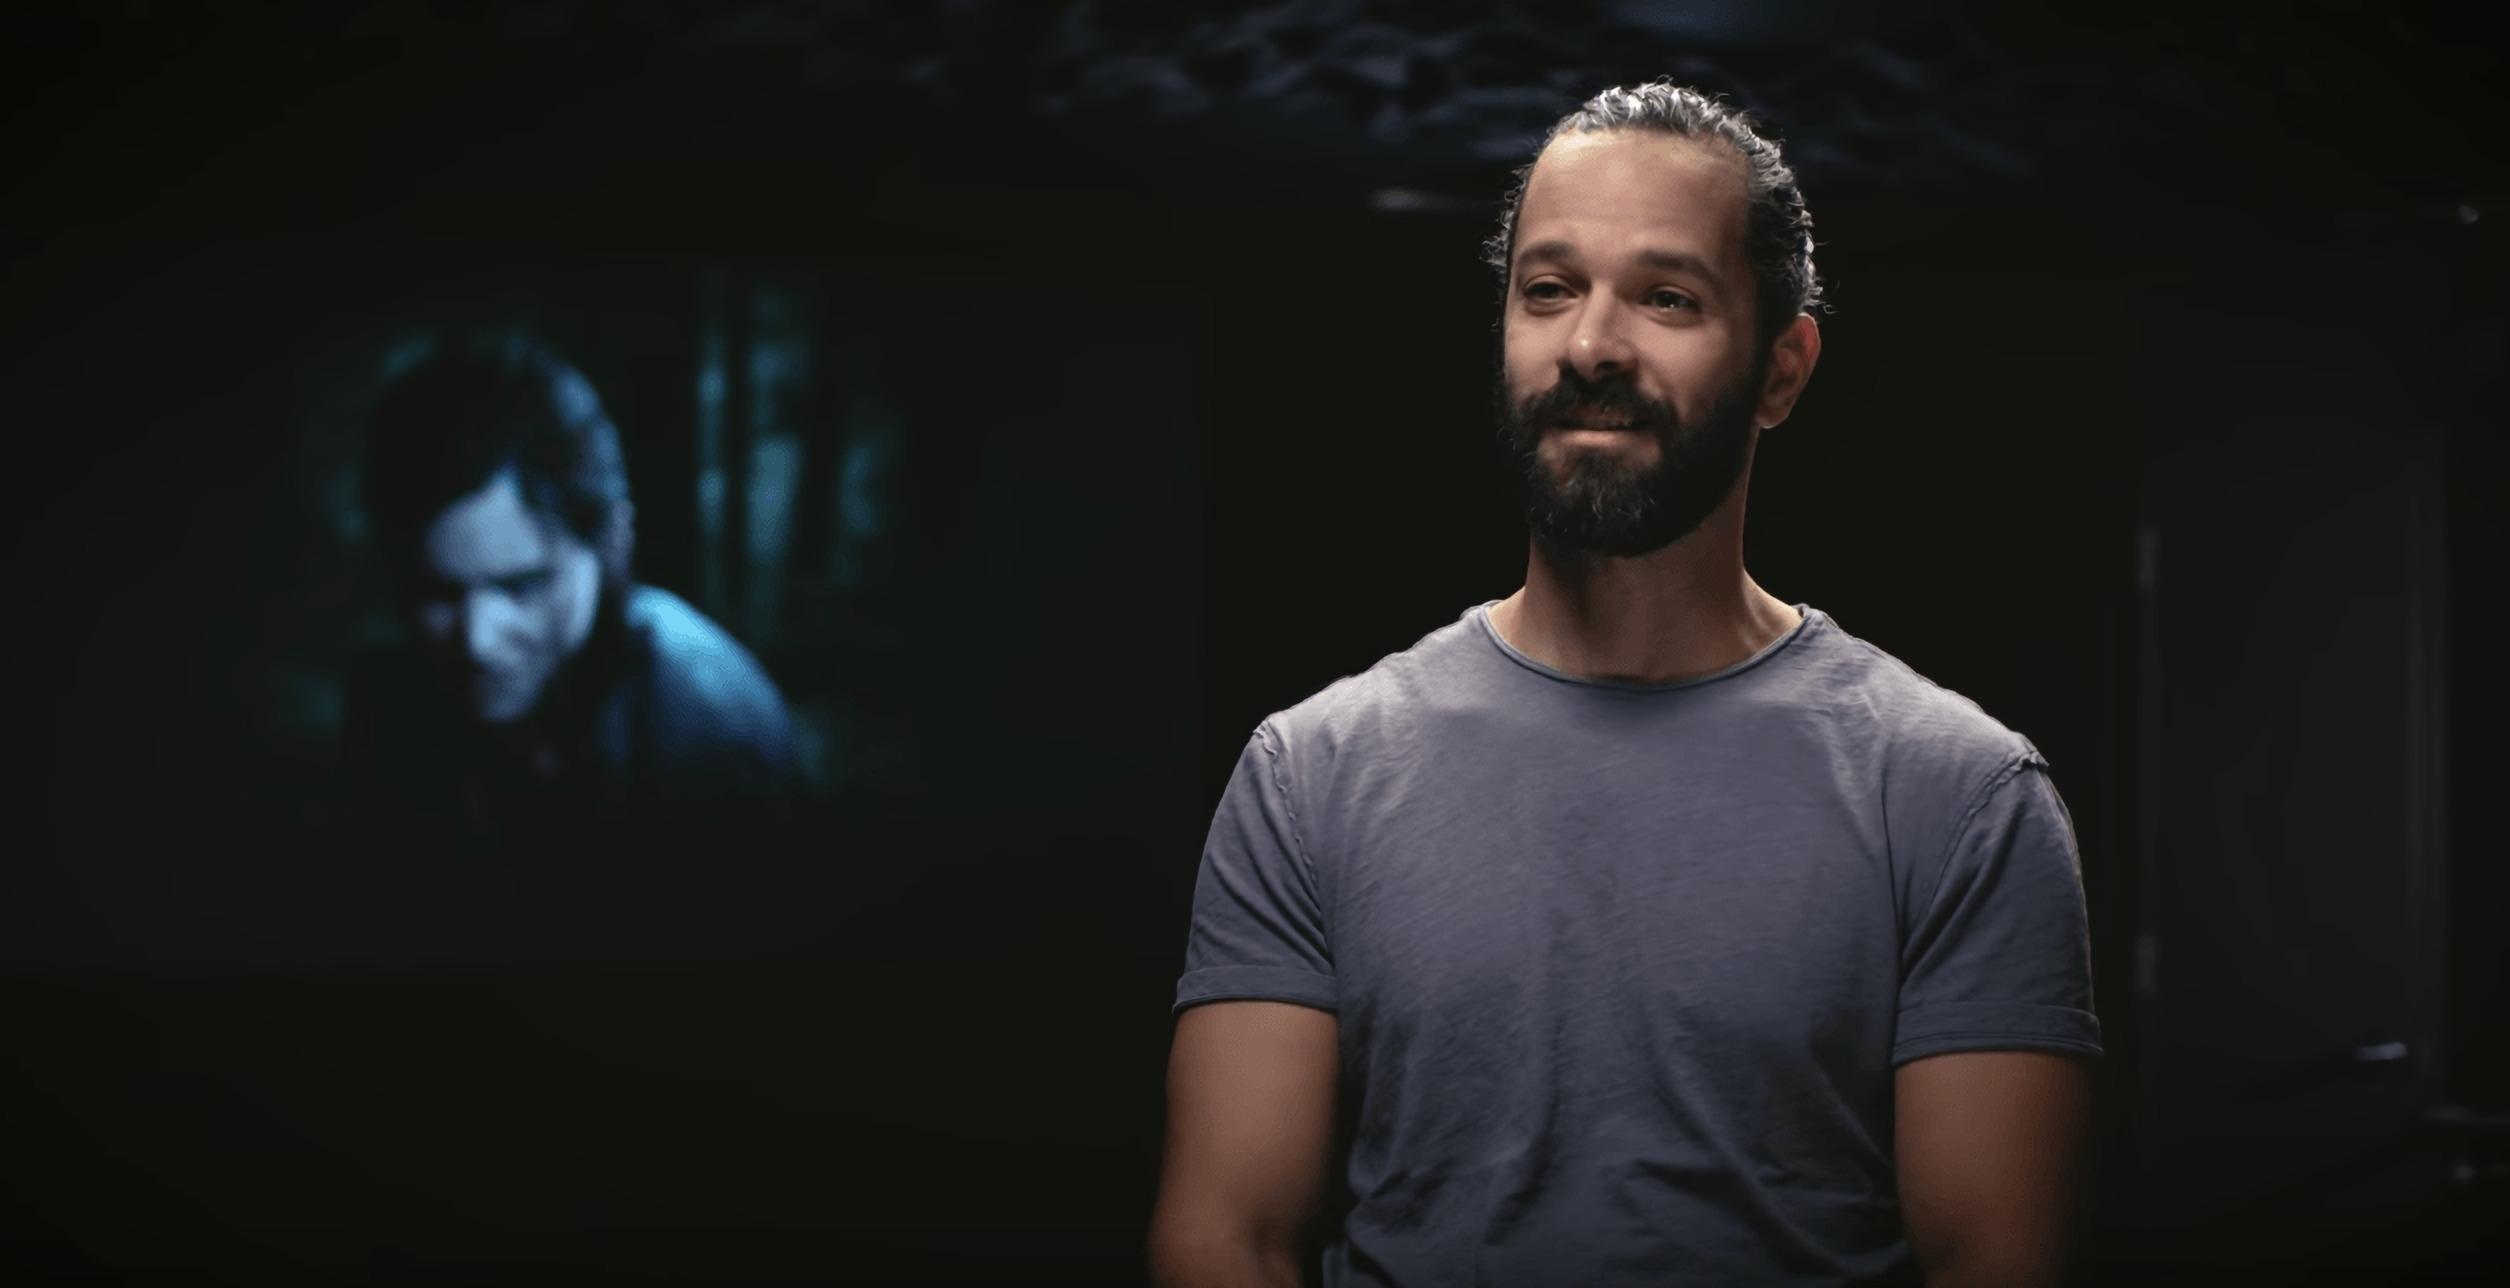 Naughty Dog не планирует выпуск дополнений для The Last of Us: Part II